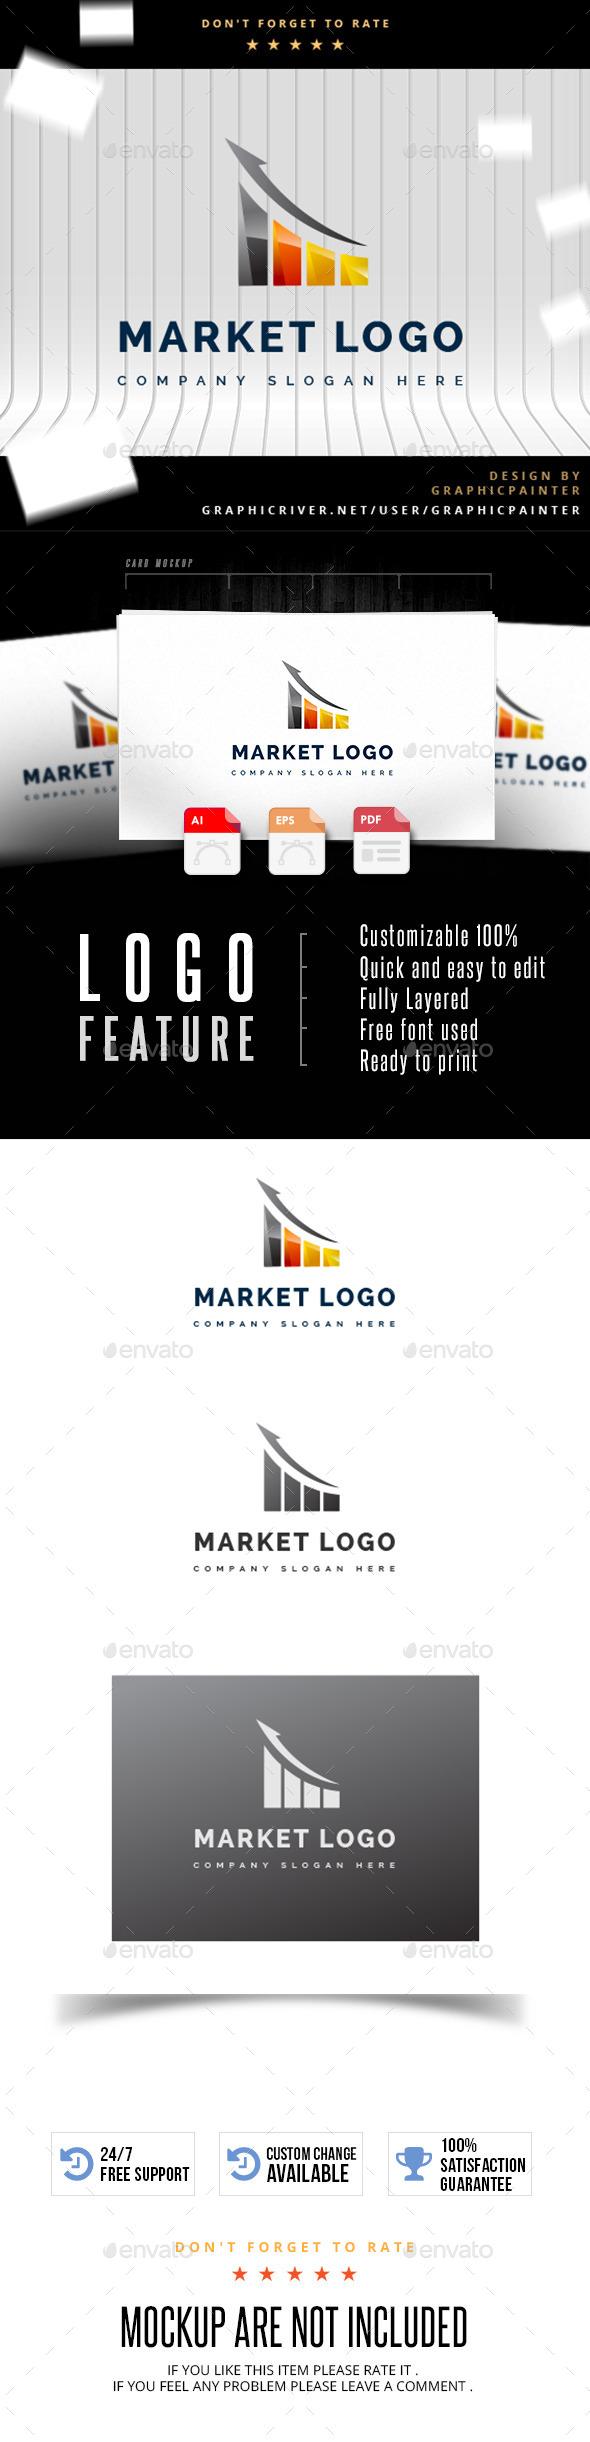 GraphicRiver Market Logo 11250462